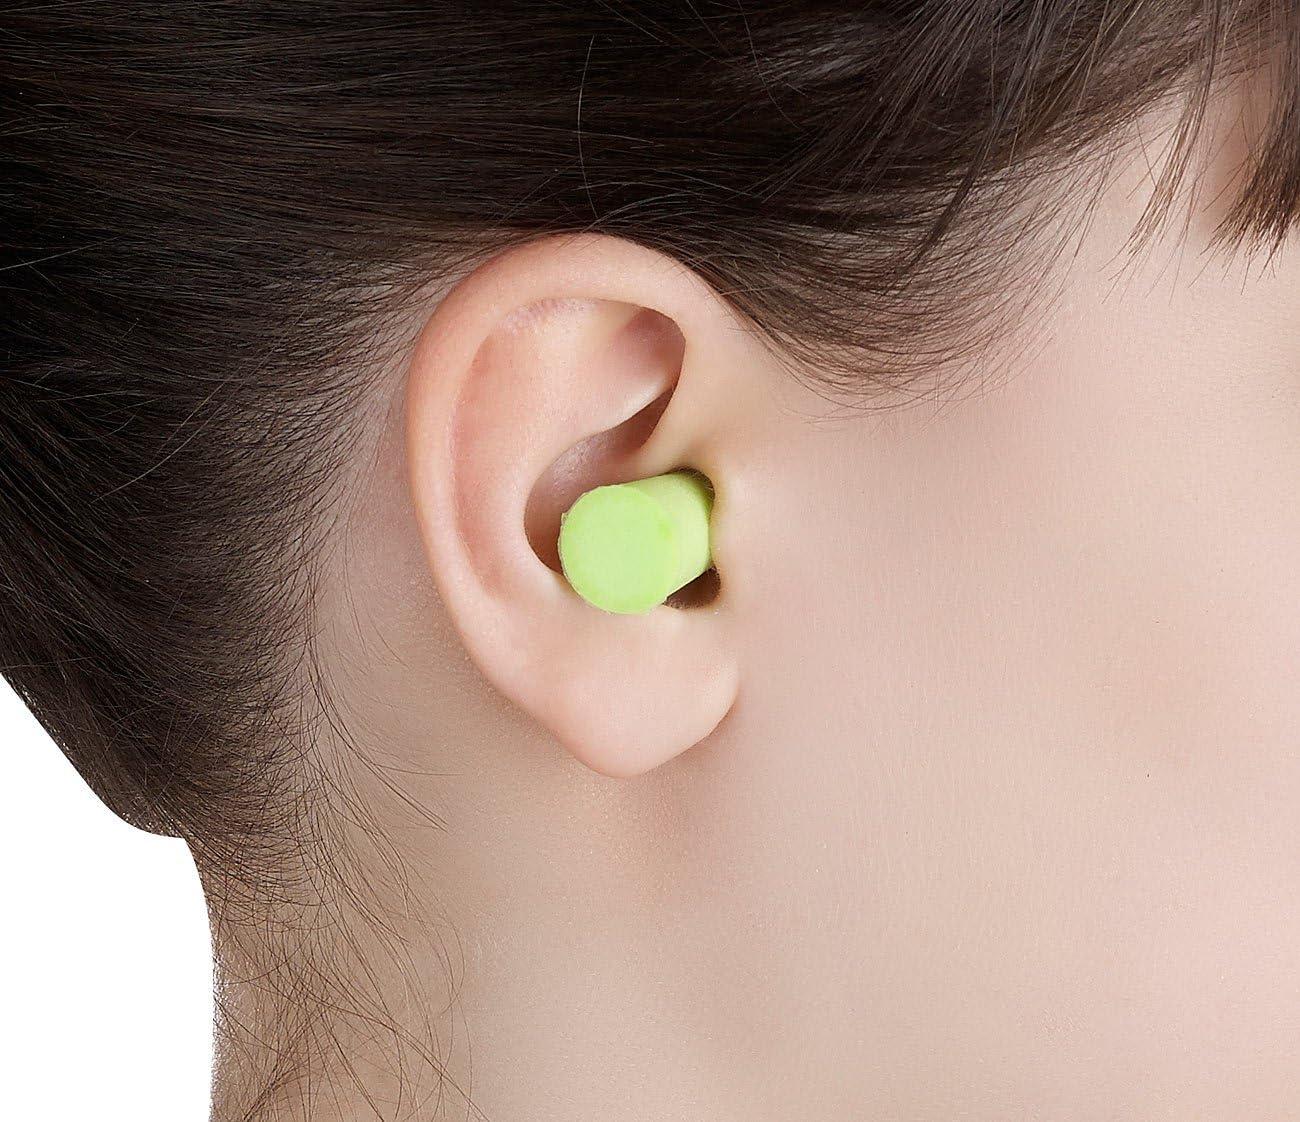 Earplugs Bulk Pack Ear Plugs Pack of 100 in 4 Colours Insulation Value 33 dB Newgen Medicals Ear Plugs